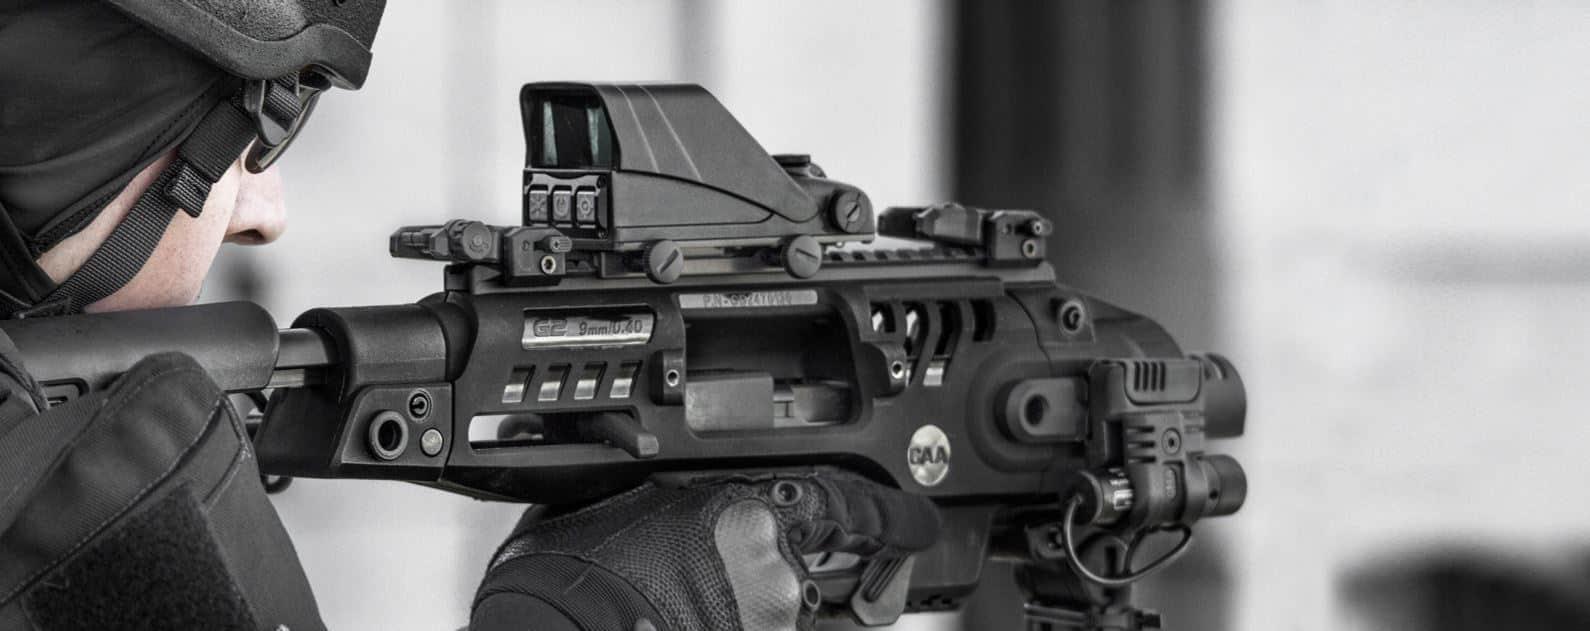 RONI® Pistol Carbine Conversion - CAA Gear Up - CAA USA